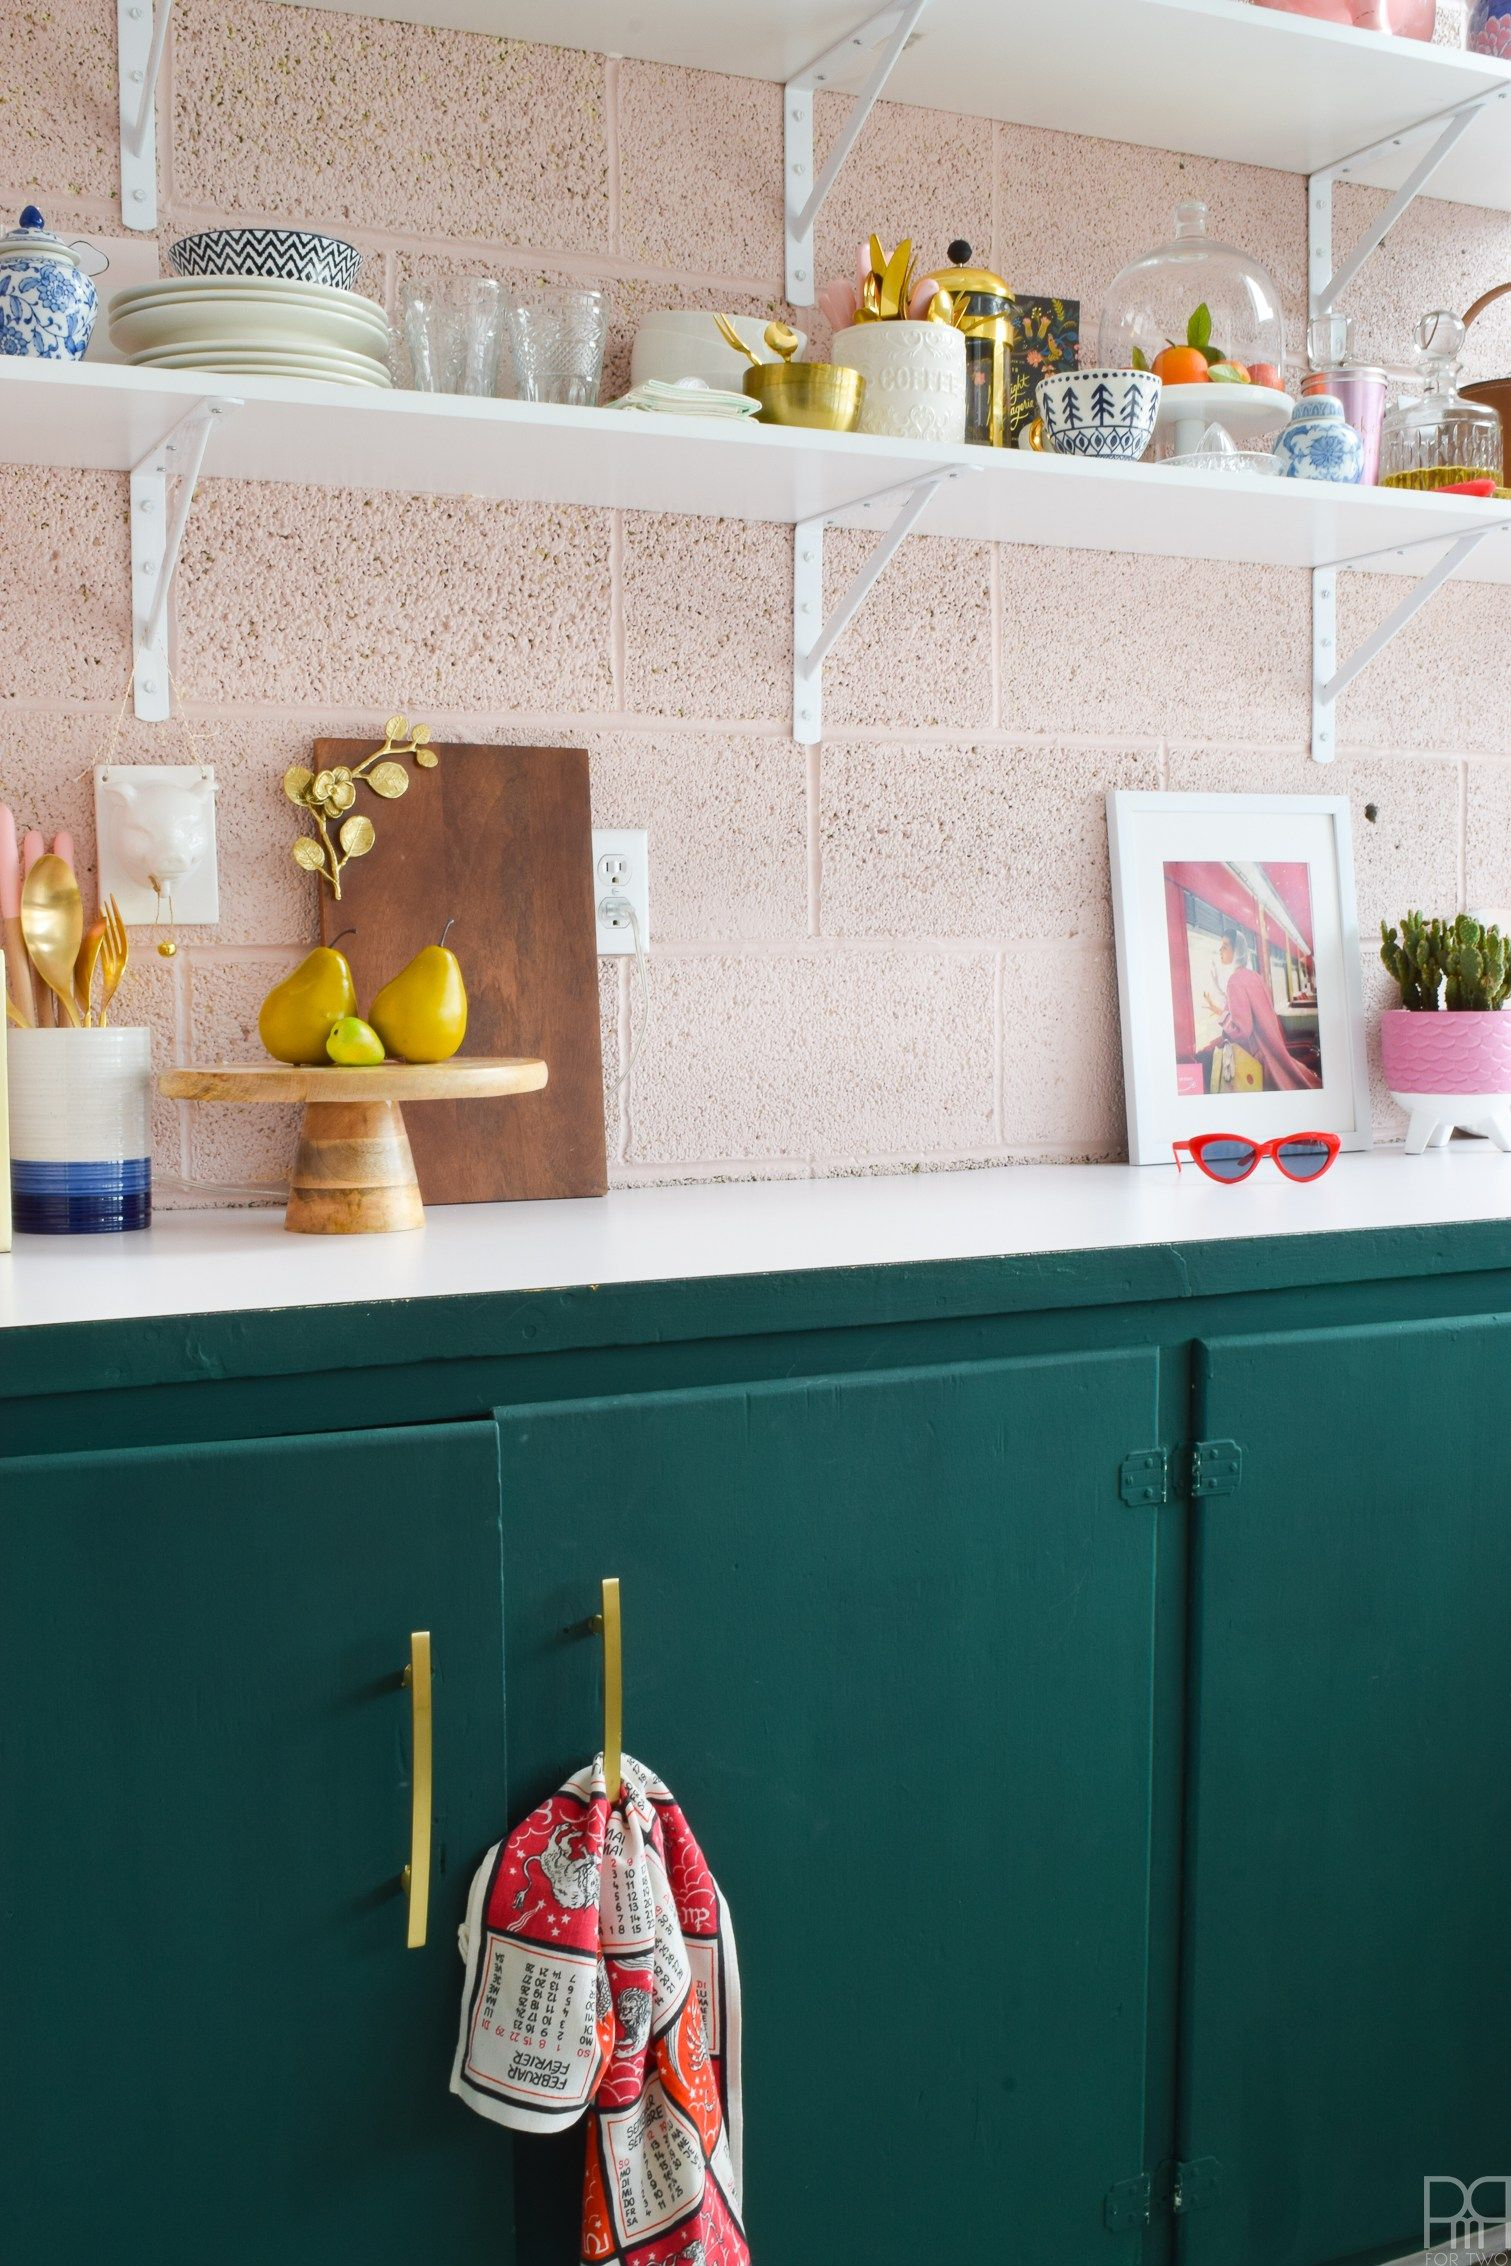 The studious eclectic u bold kitchen rental kitchen kitchen